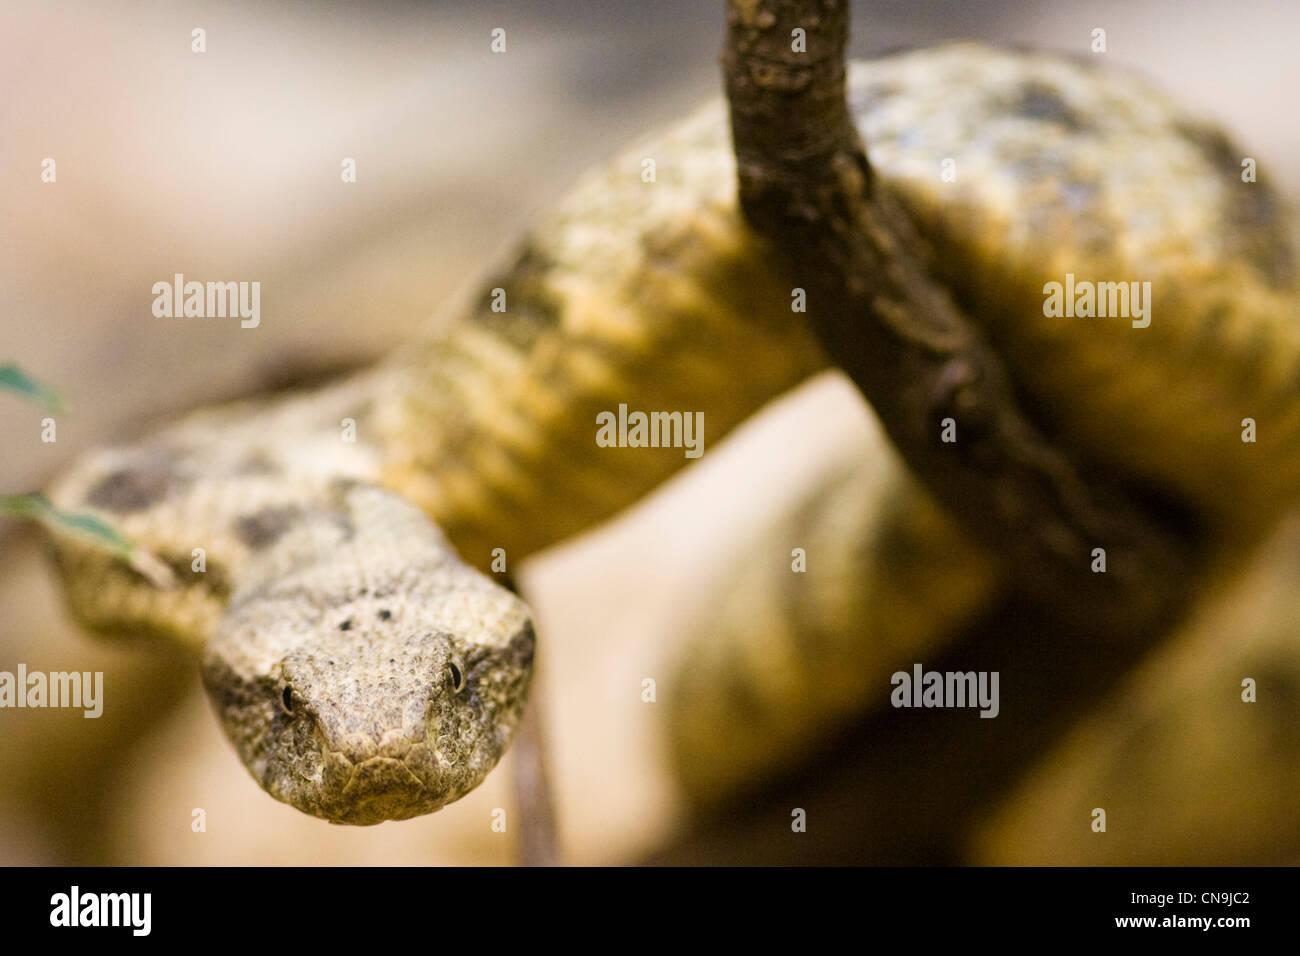 Viper - Macrovipera lebetina levantina - serpiente venenosa Imagen De Stock